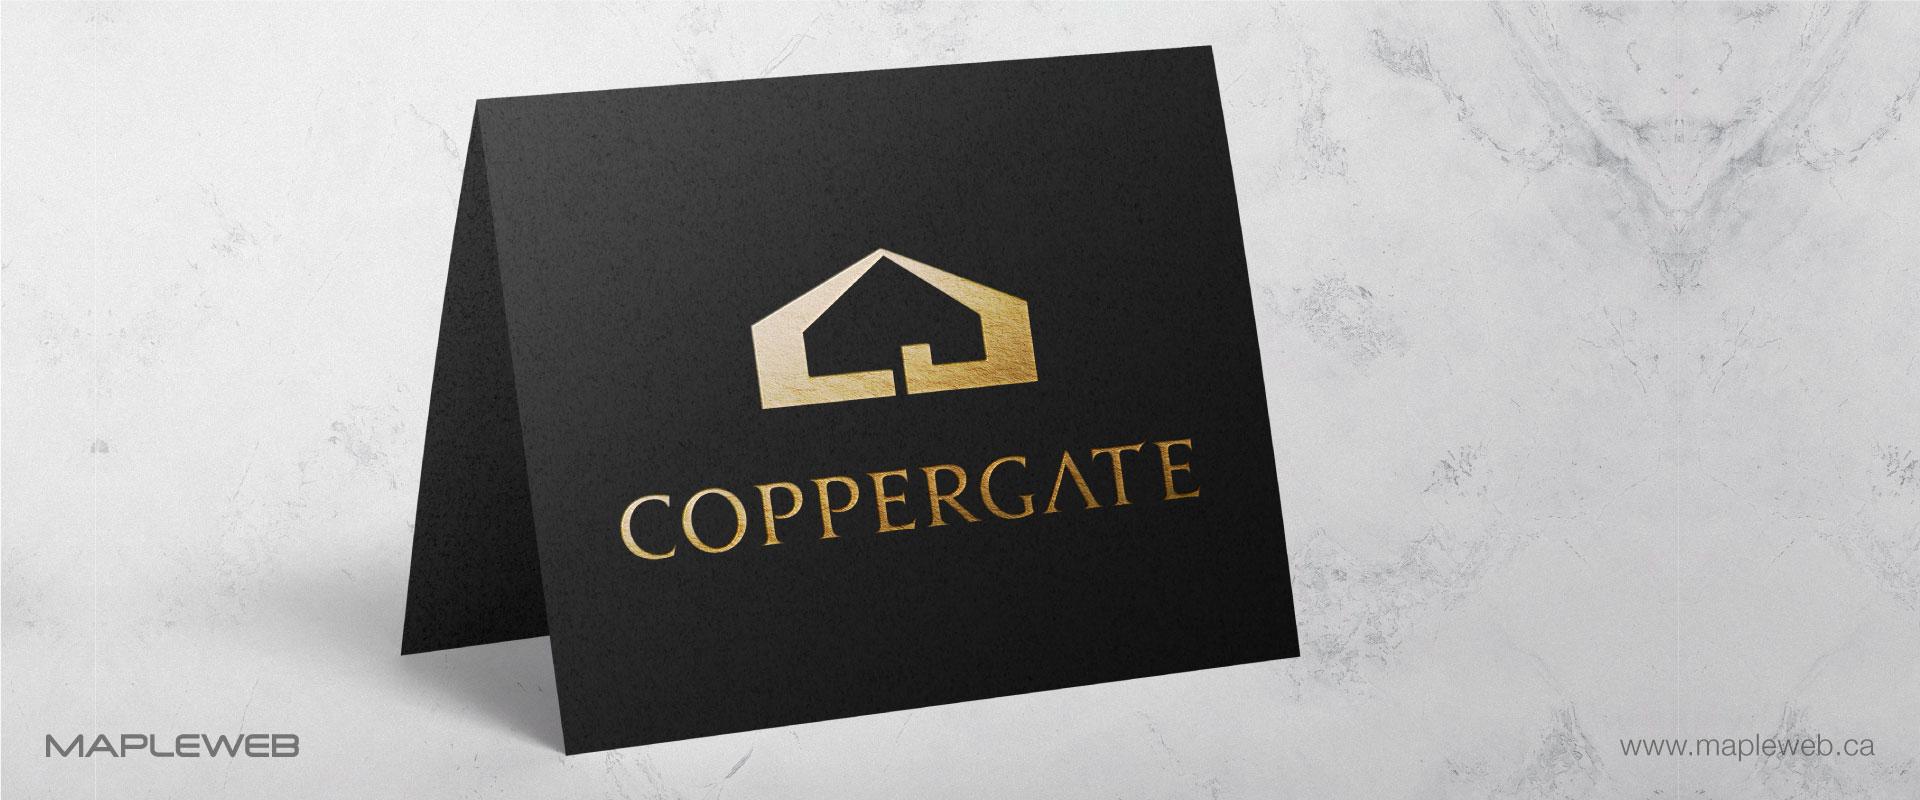 coppergate-brand-logo-design-by-mapleweb-vancouver-canada-black-folded-paper-mock